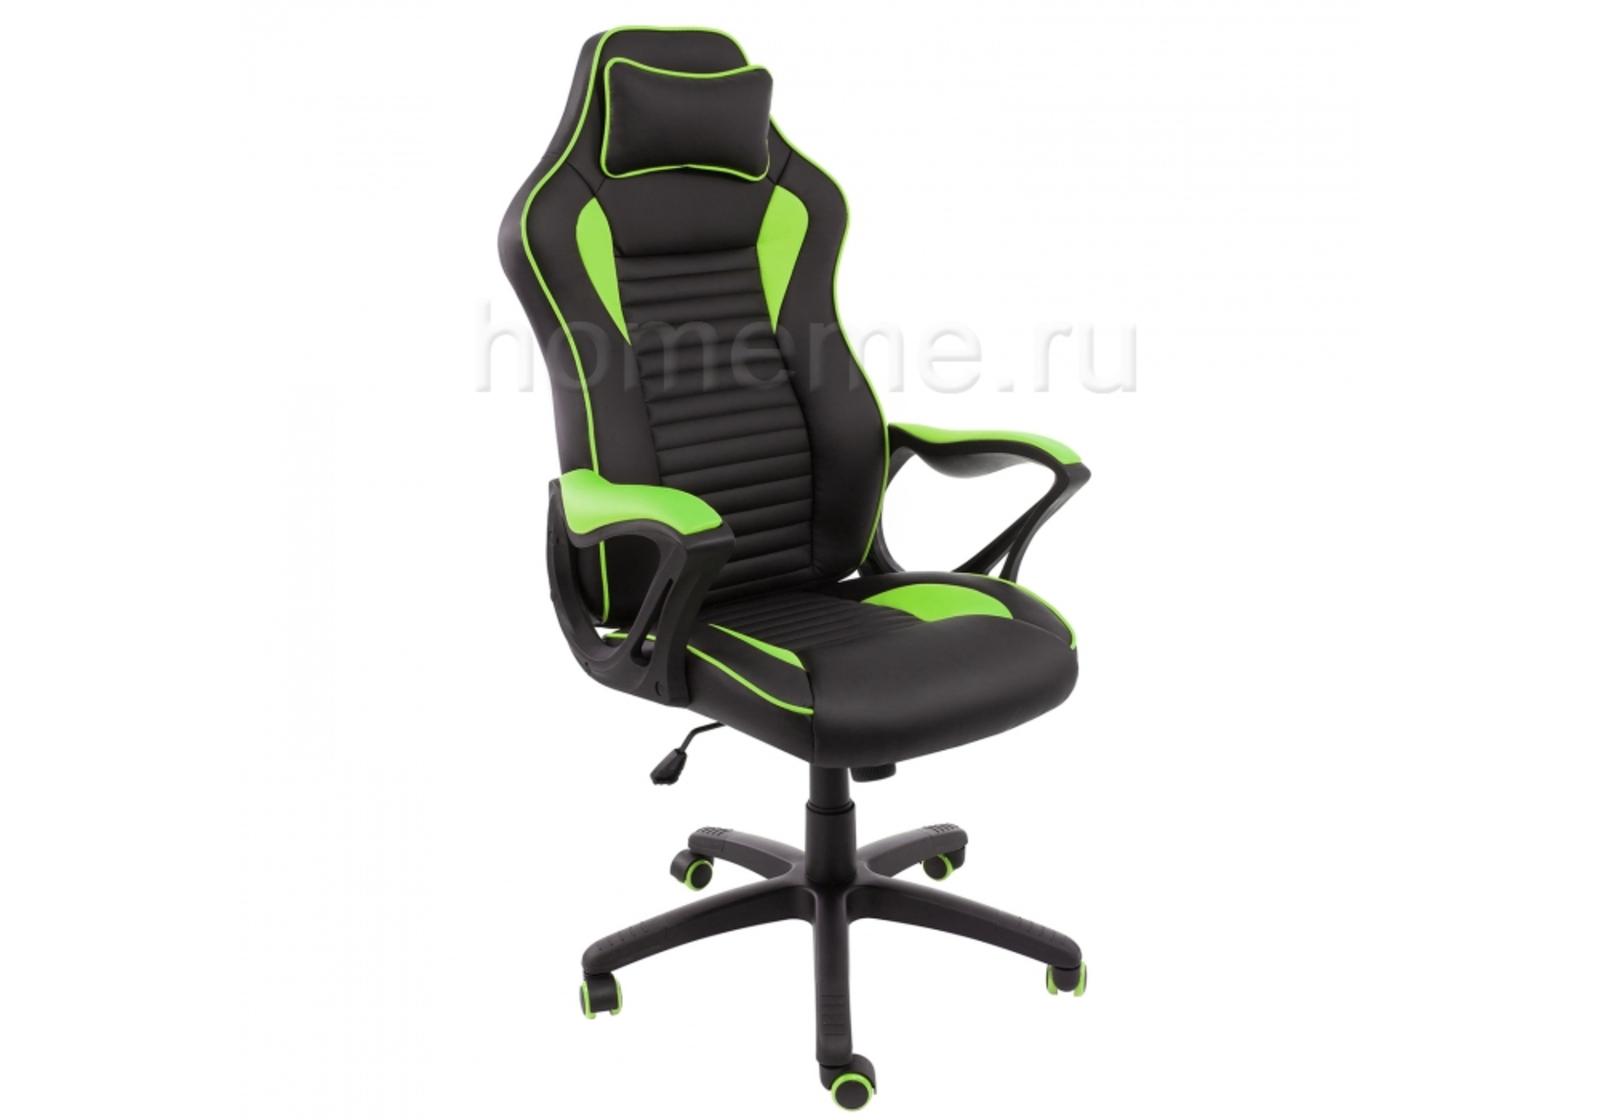 Кресло для офиса HomeMe Leon черное / зеленое 1877 от Homeme.ru